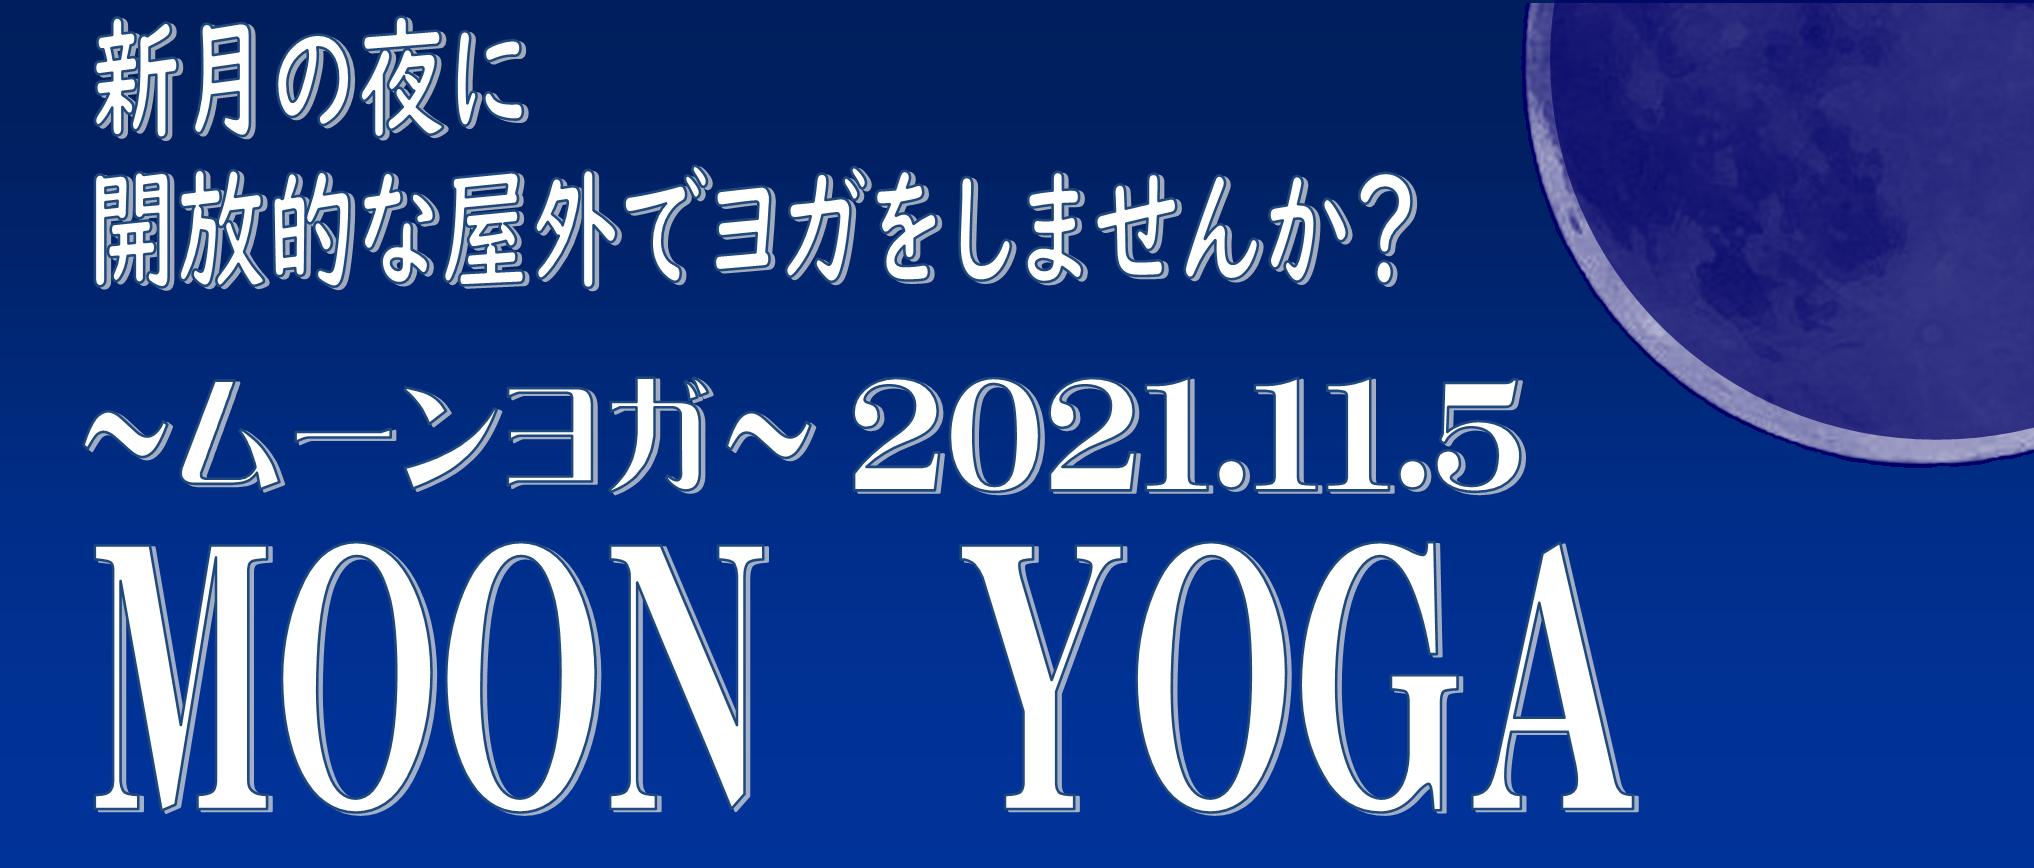 11月5日(金)開催 ムーンヨガ参加者募集